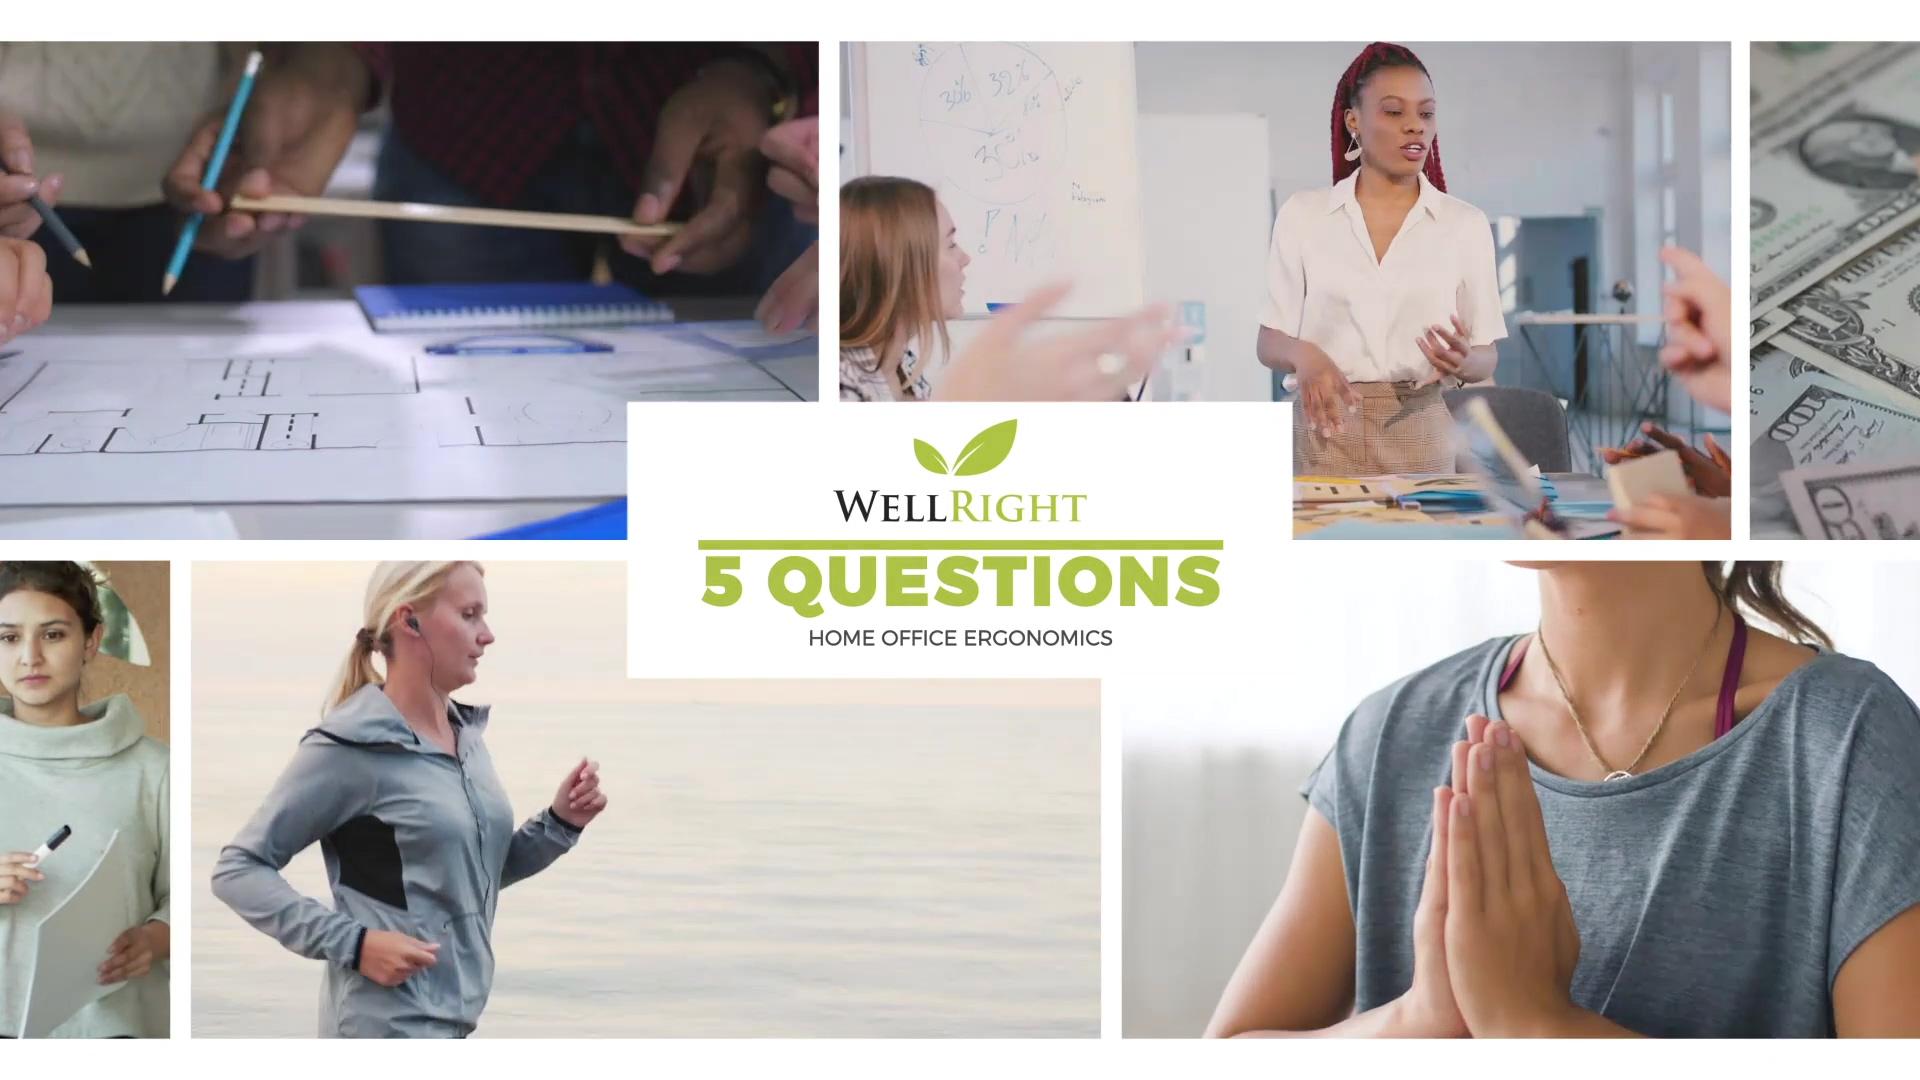 5 Questions - Home Office Ergonomics